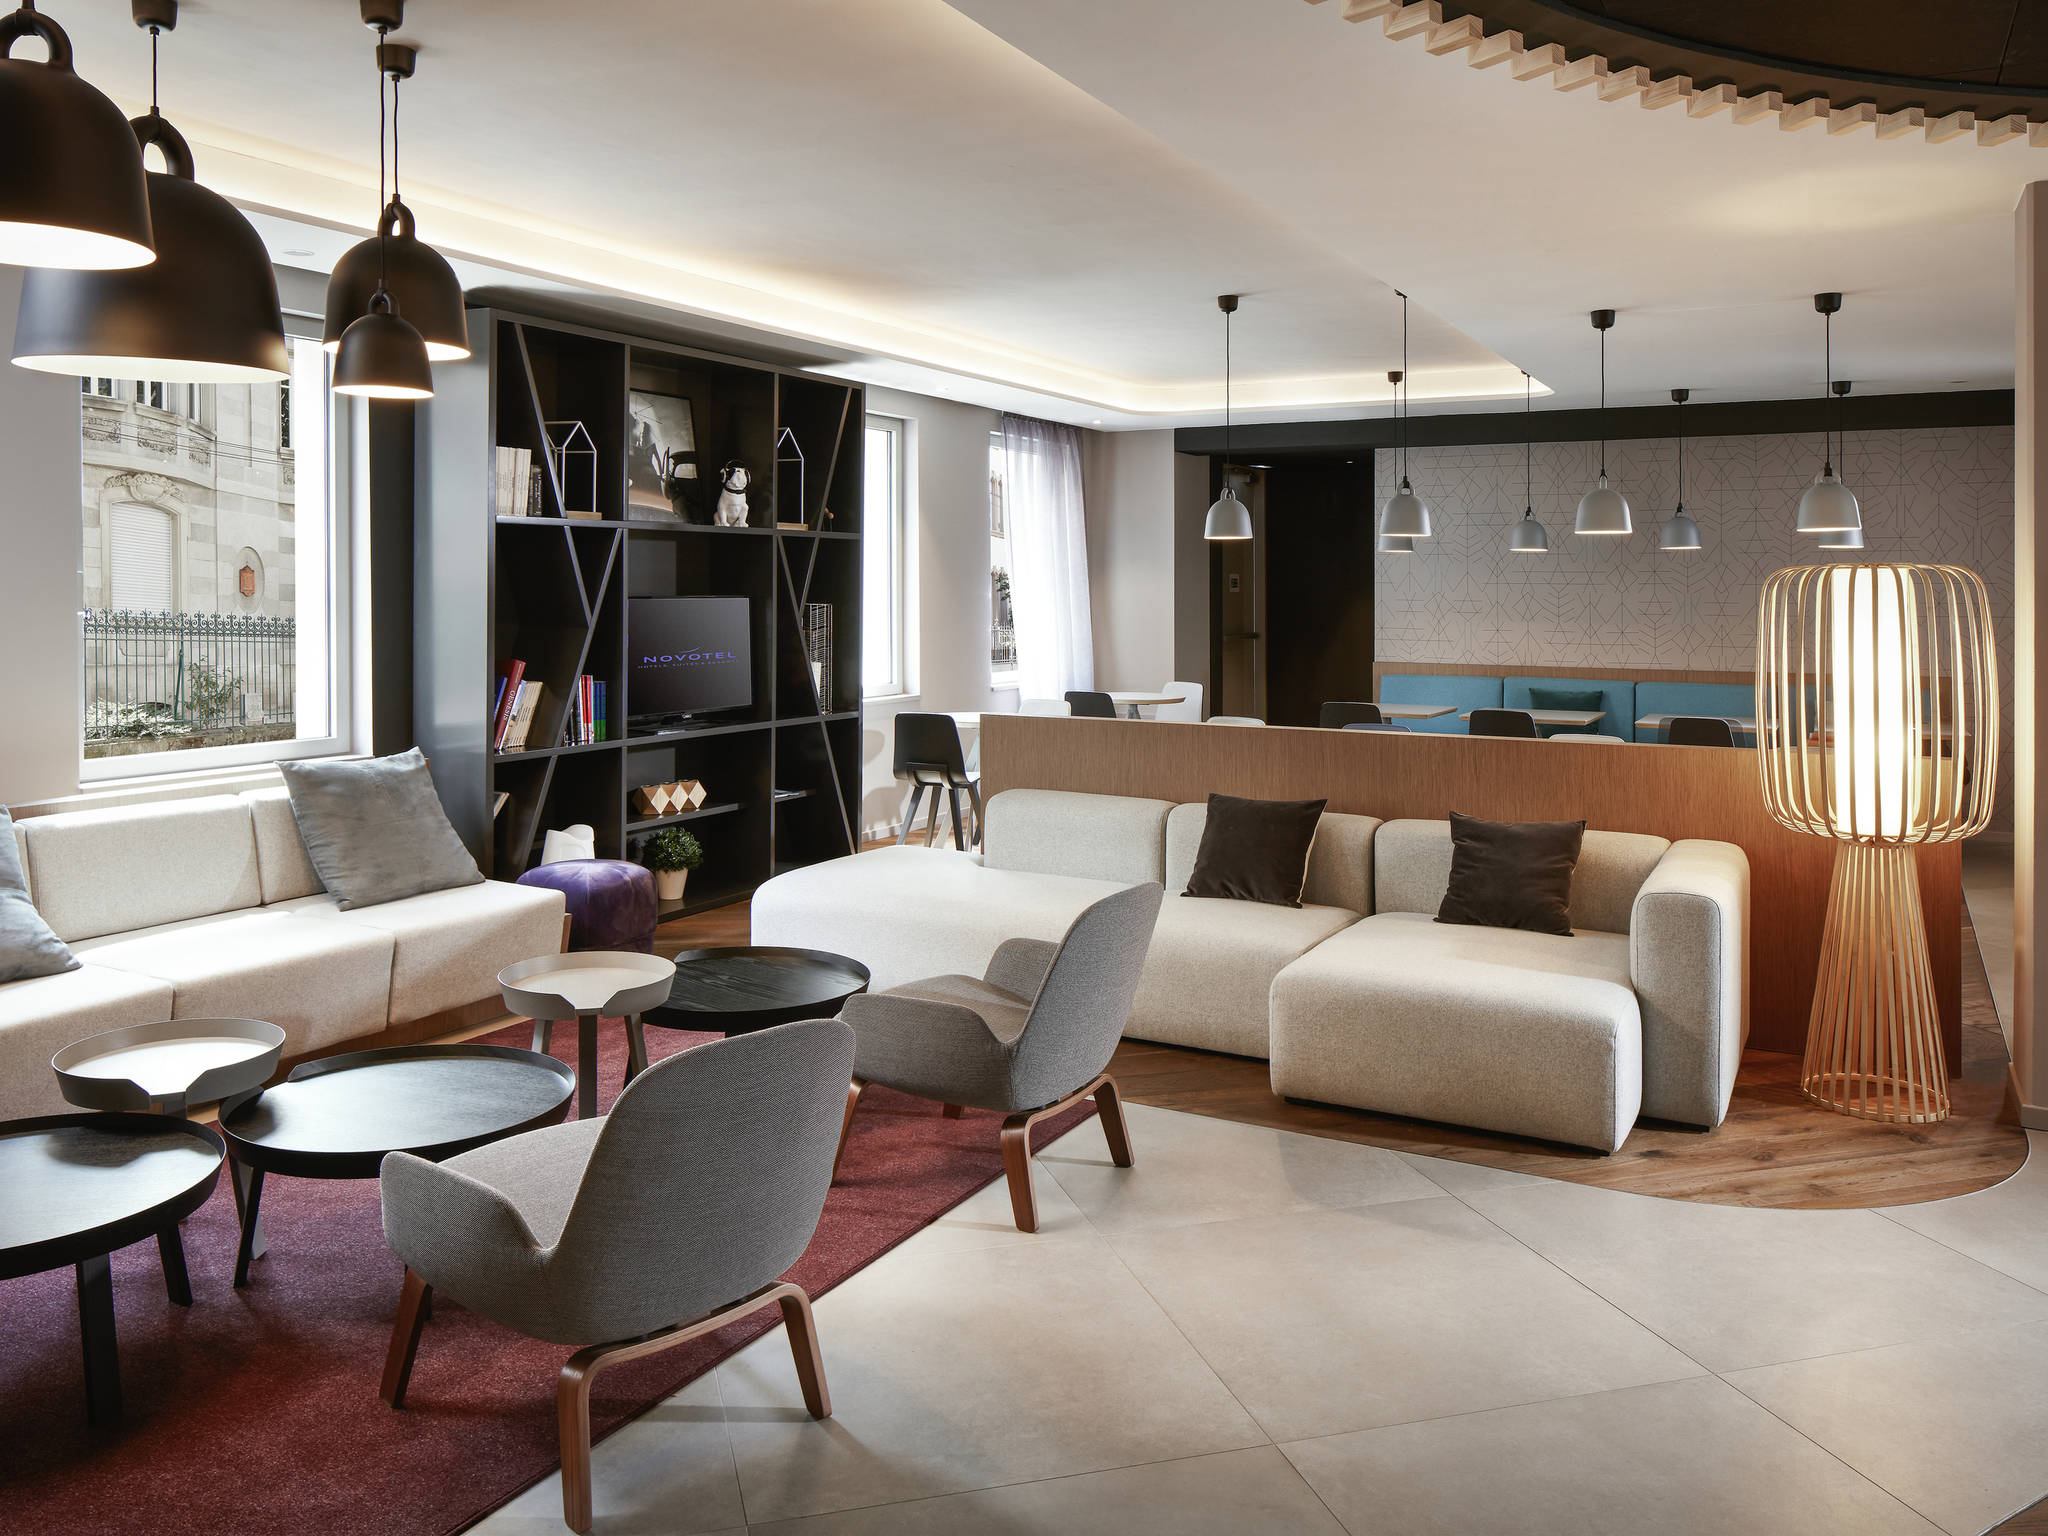 Hotel – Novotel Suites Colmar Centre (opening: april 2018)